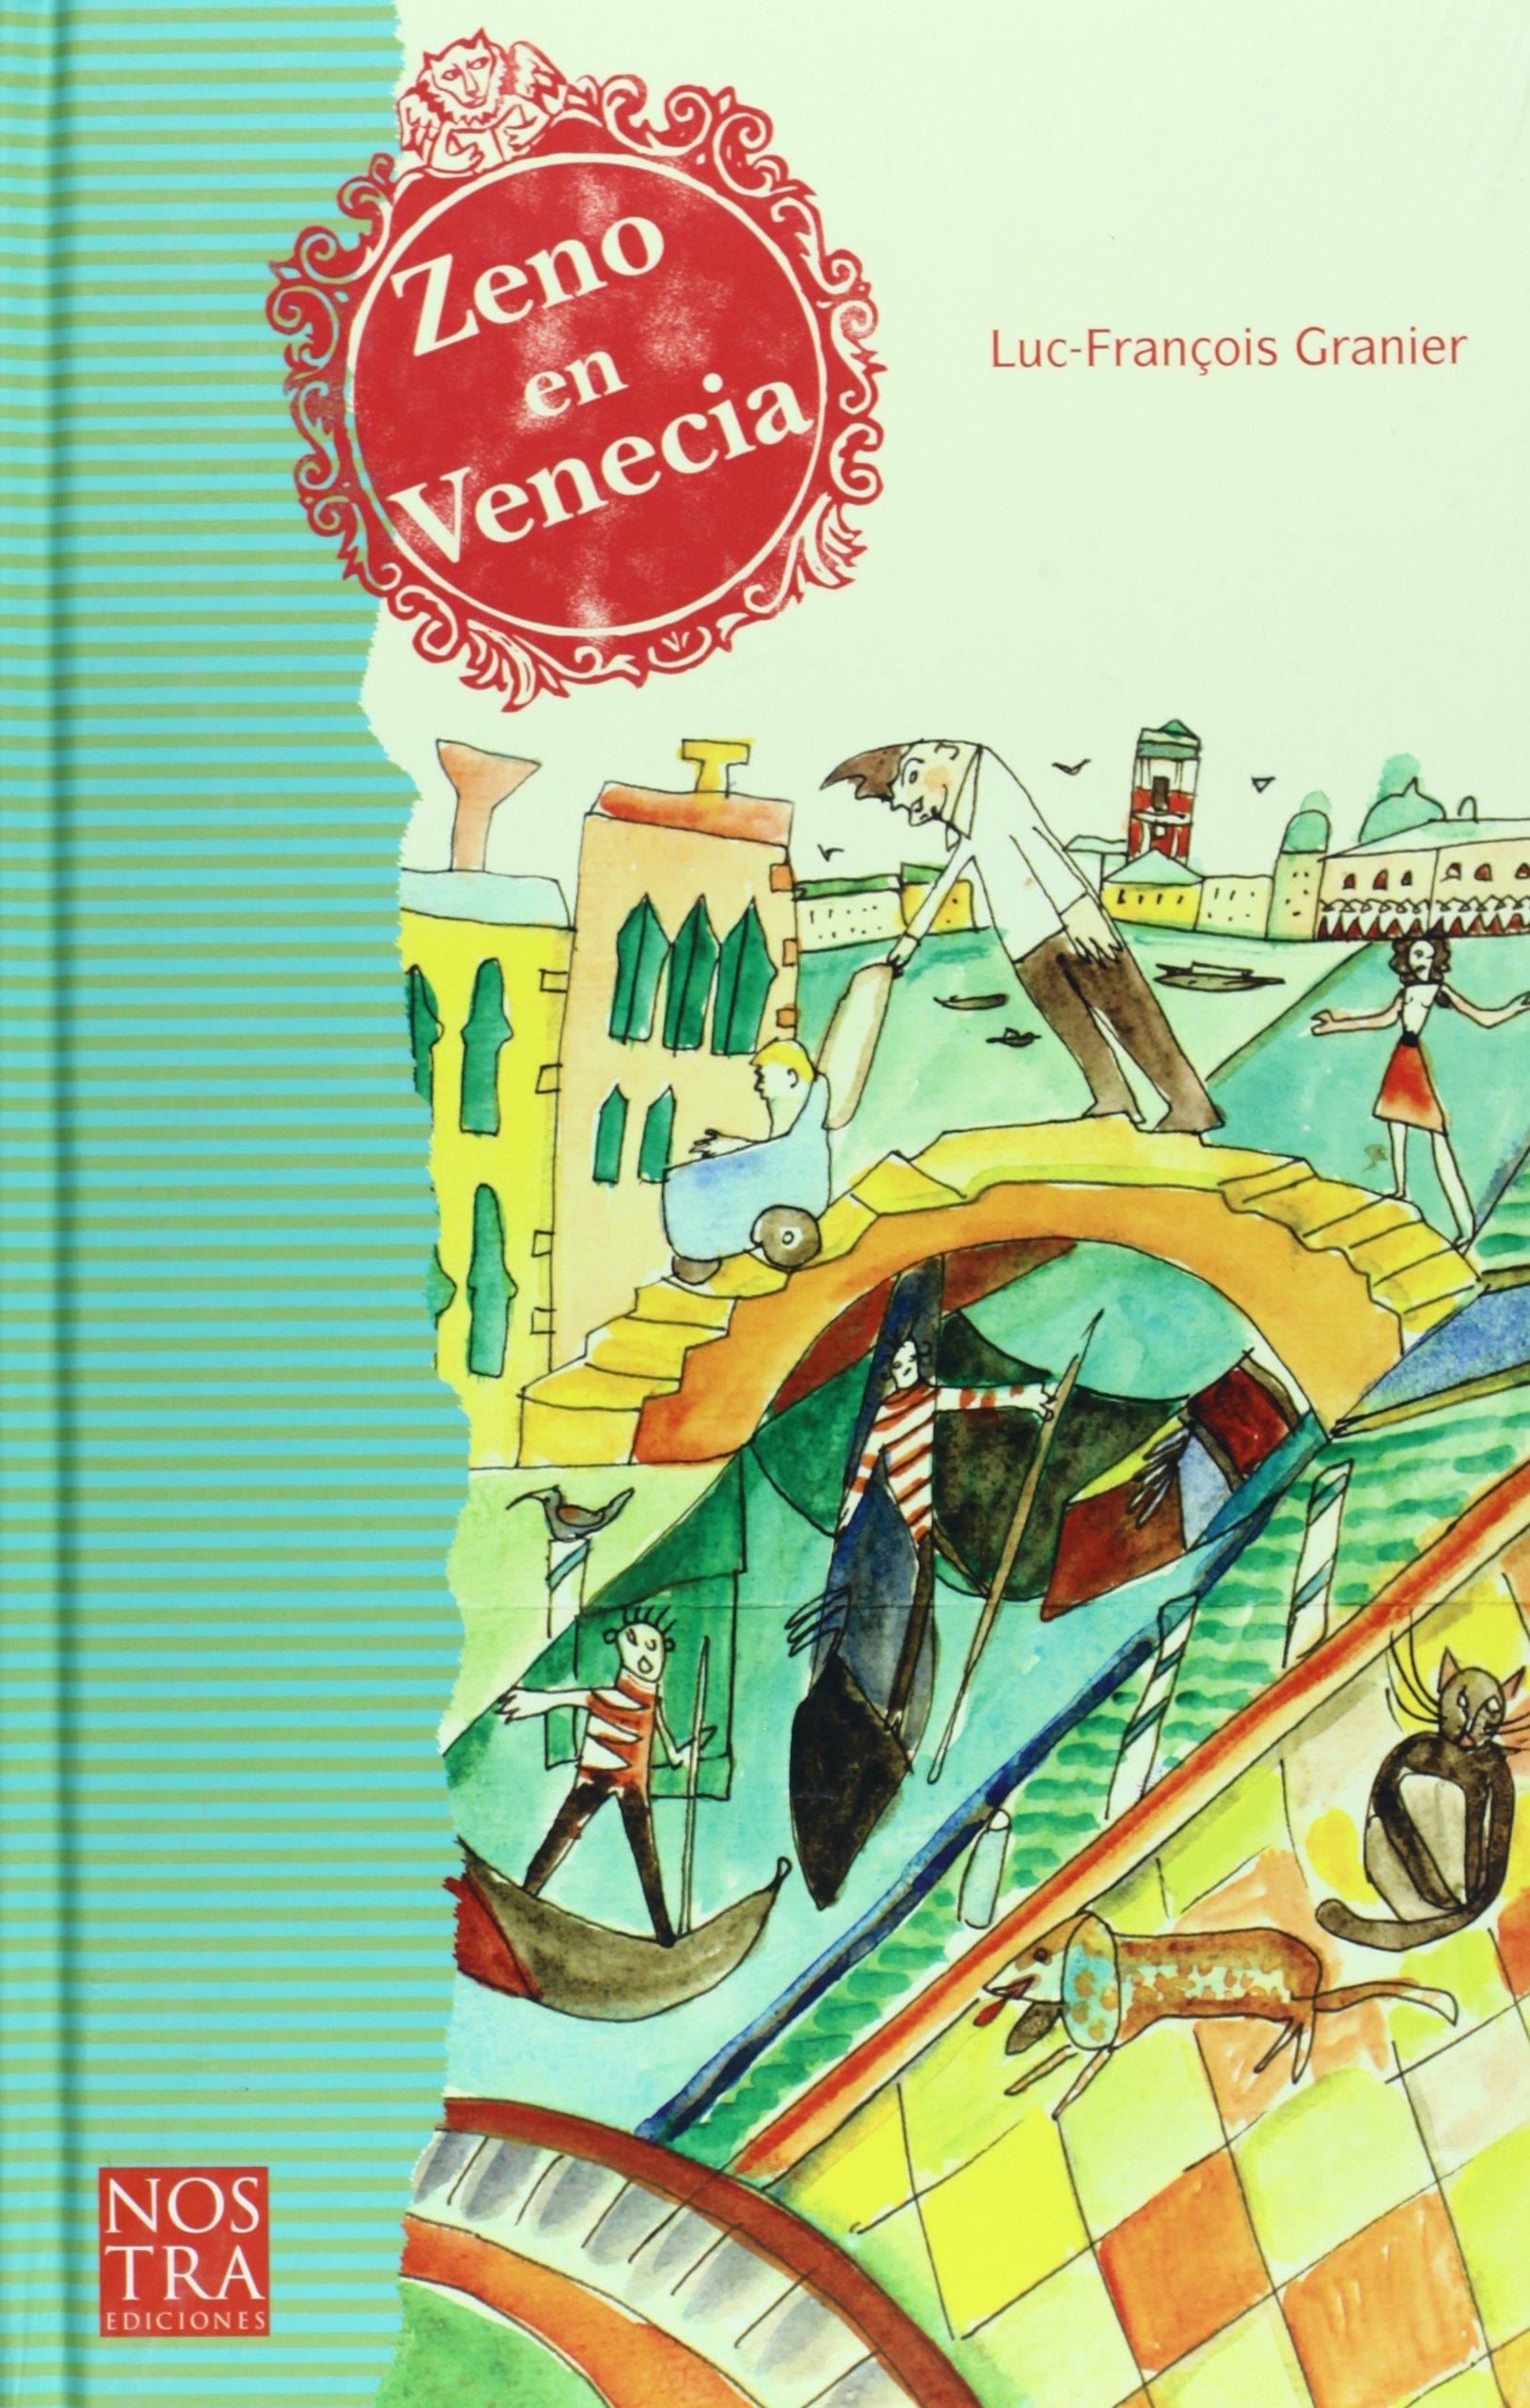 Zeno en Venecia (Spanish Edition): Granier Luc-Francois ...